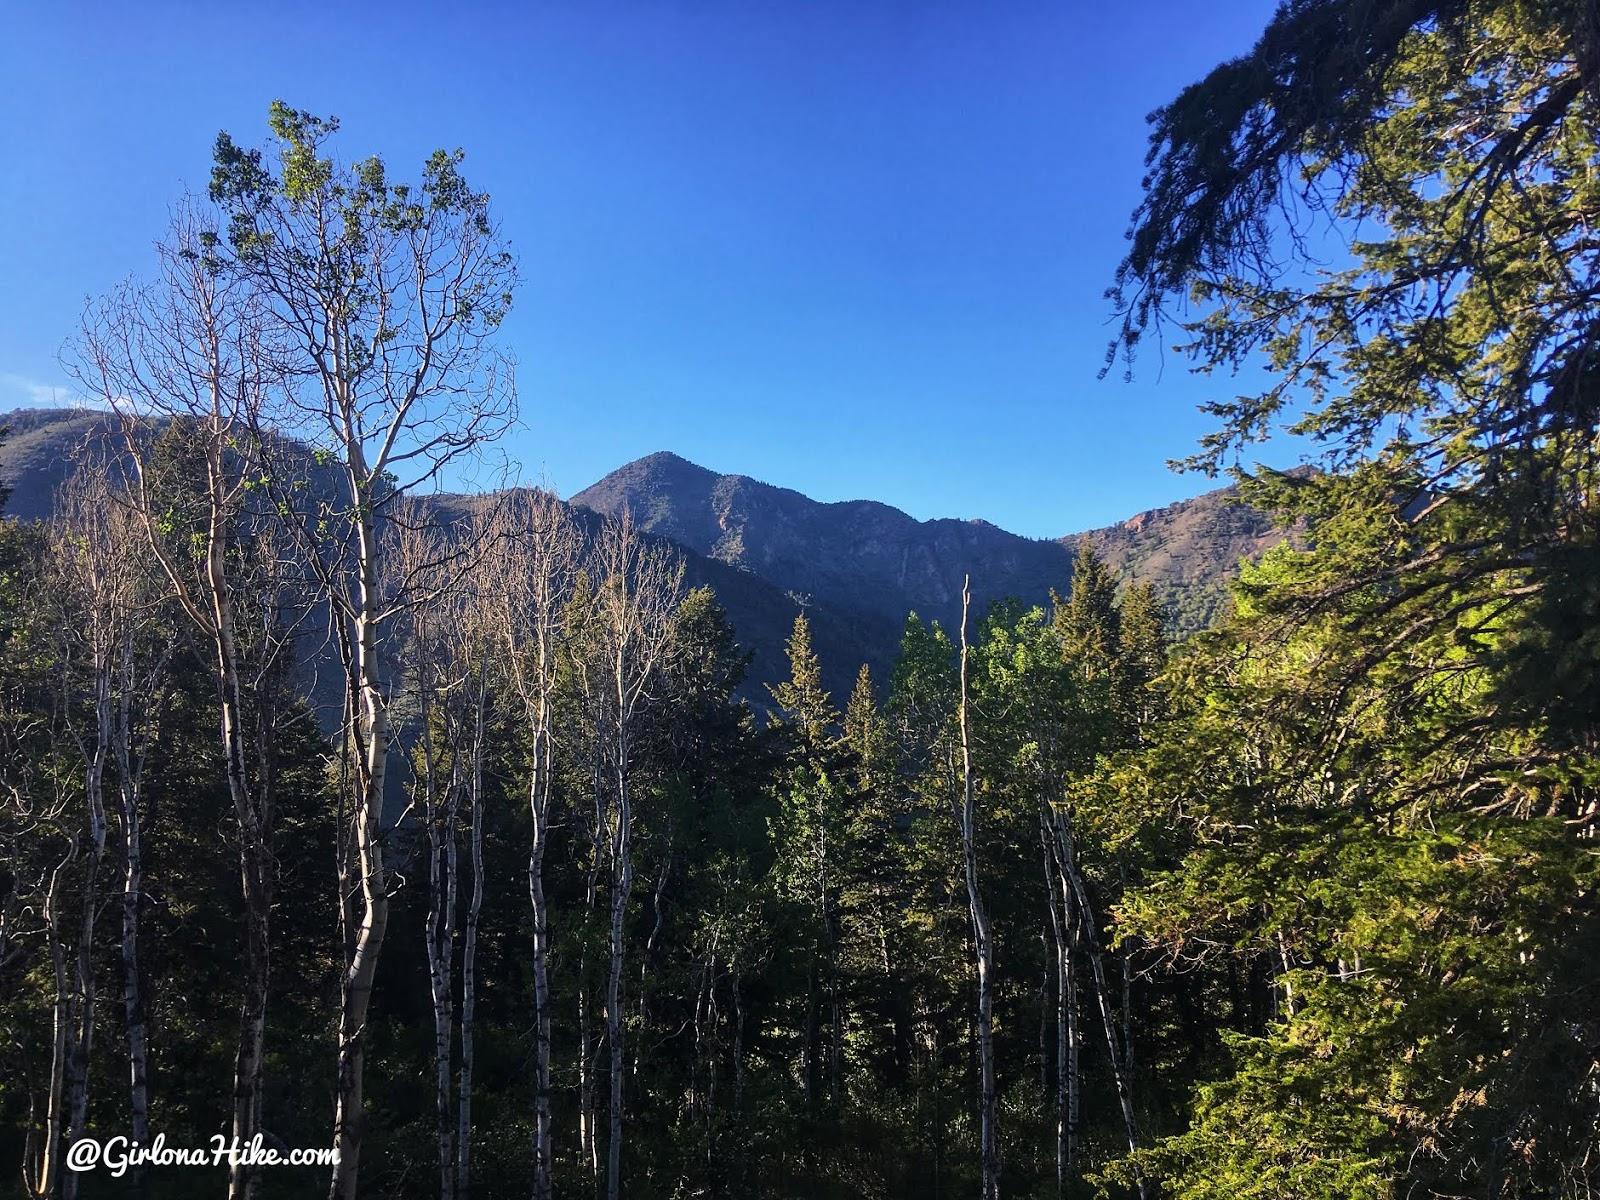 Hiking the Terraces Trail, Millcreek Canyon, Hiking in Utah with Dogs, Hiking in Millcreek Canyon